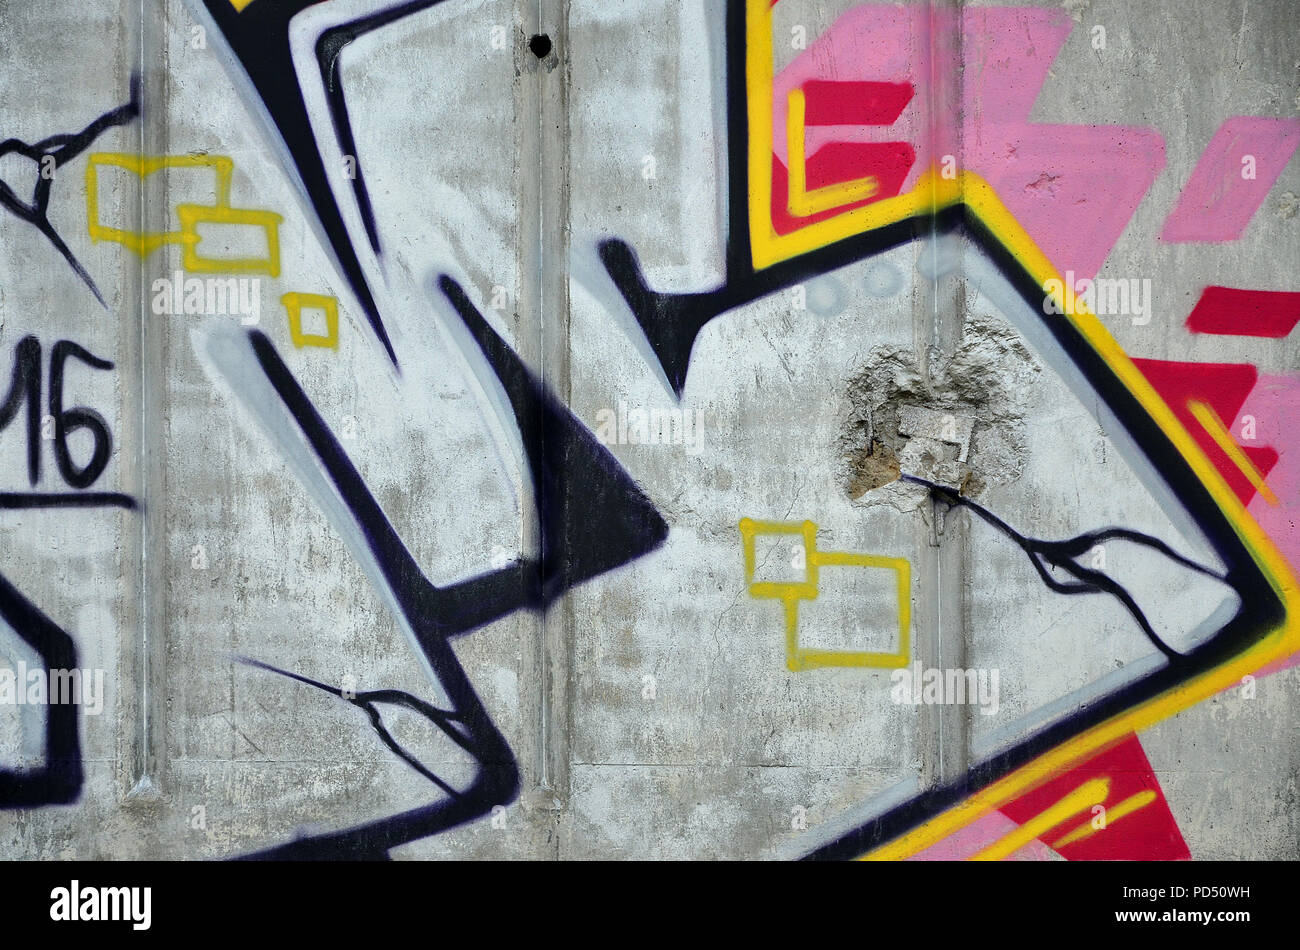 Beautiful Street Art Graffiti Abstract Colors Creative Fashion Drawing City Walls Urban Contemporary Culture